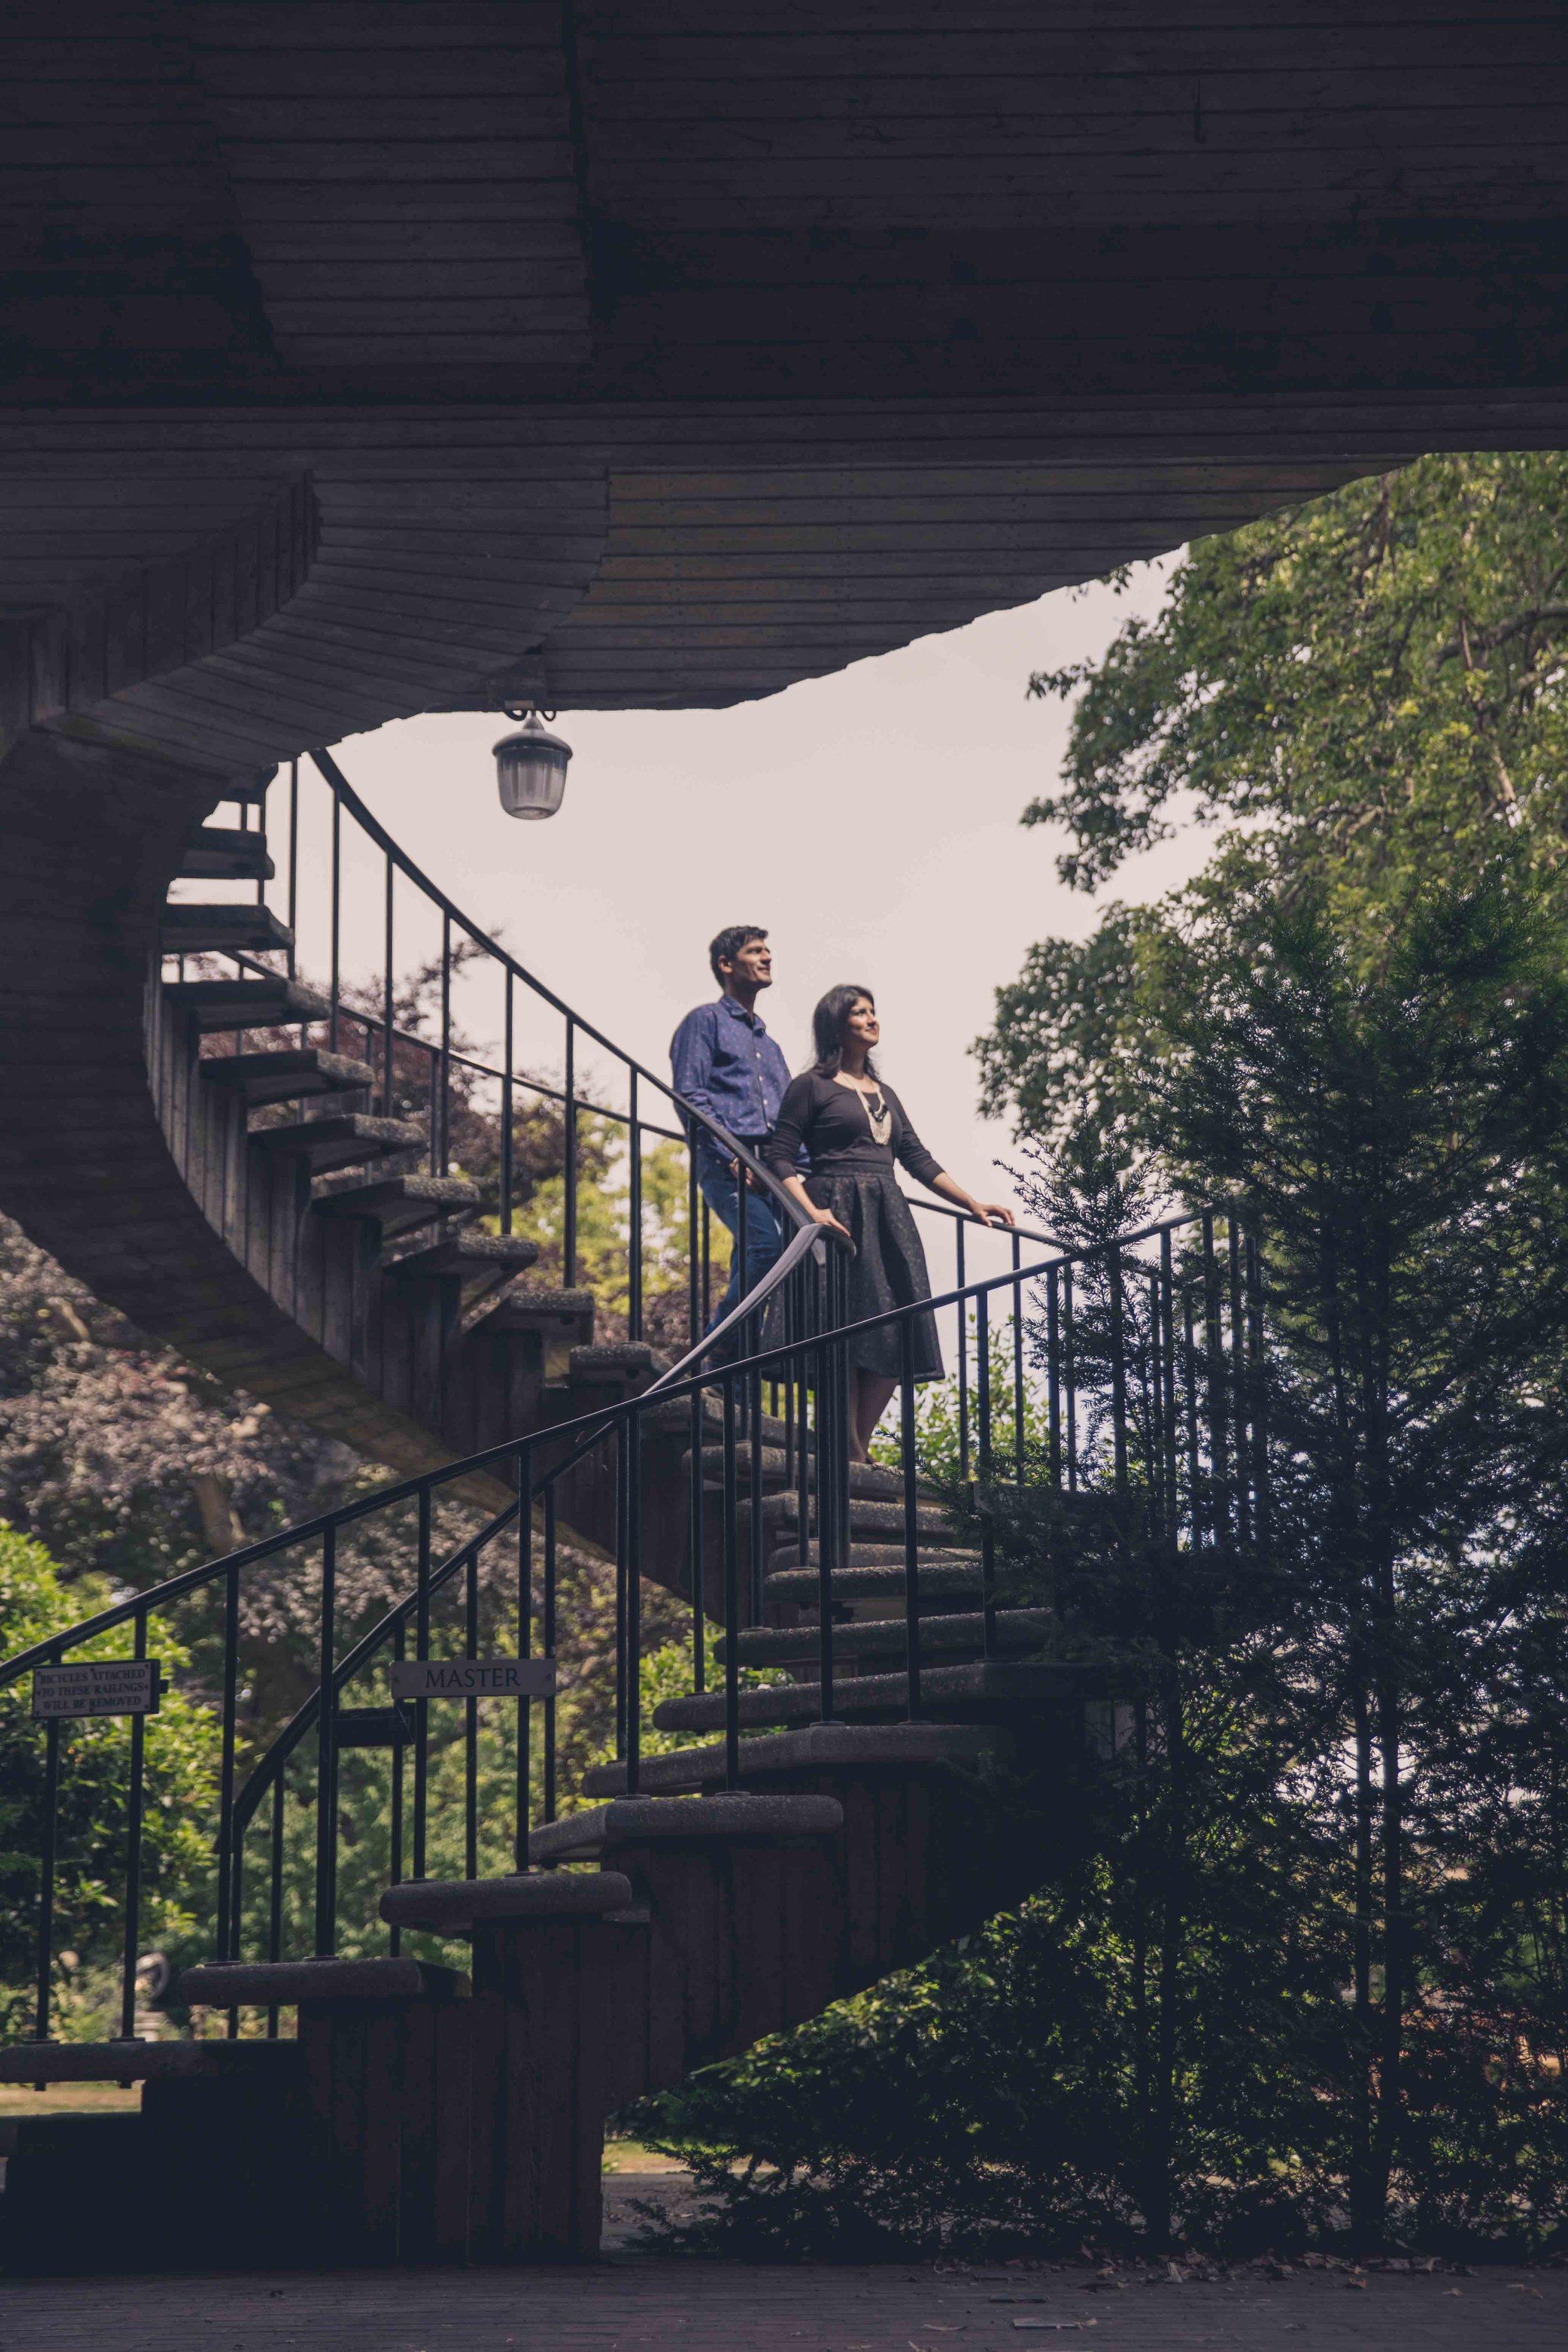 cambridge-pre-wedding-prewedding-engagement-photoshoot-shoot-photographer-asian-wedding-natalia-smith-photography-3.jpg